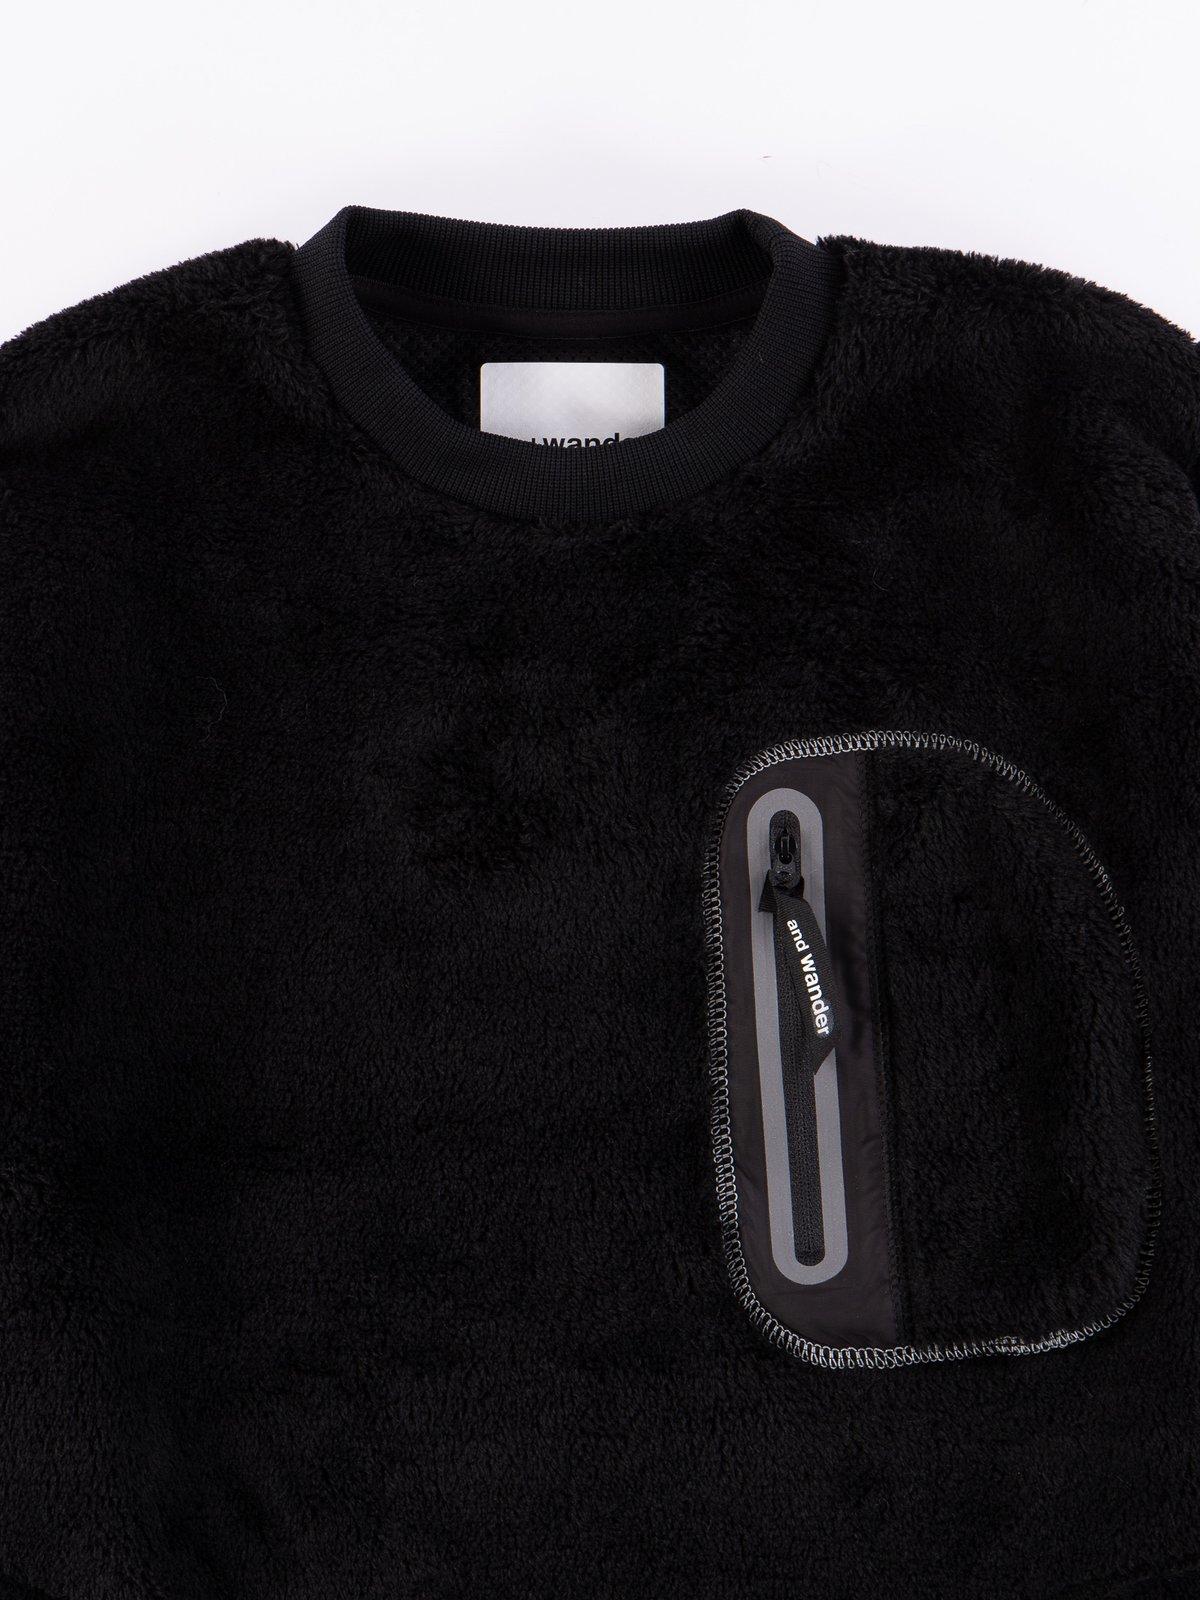 Black High Loft Fleece Pullover - Image 4